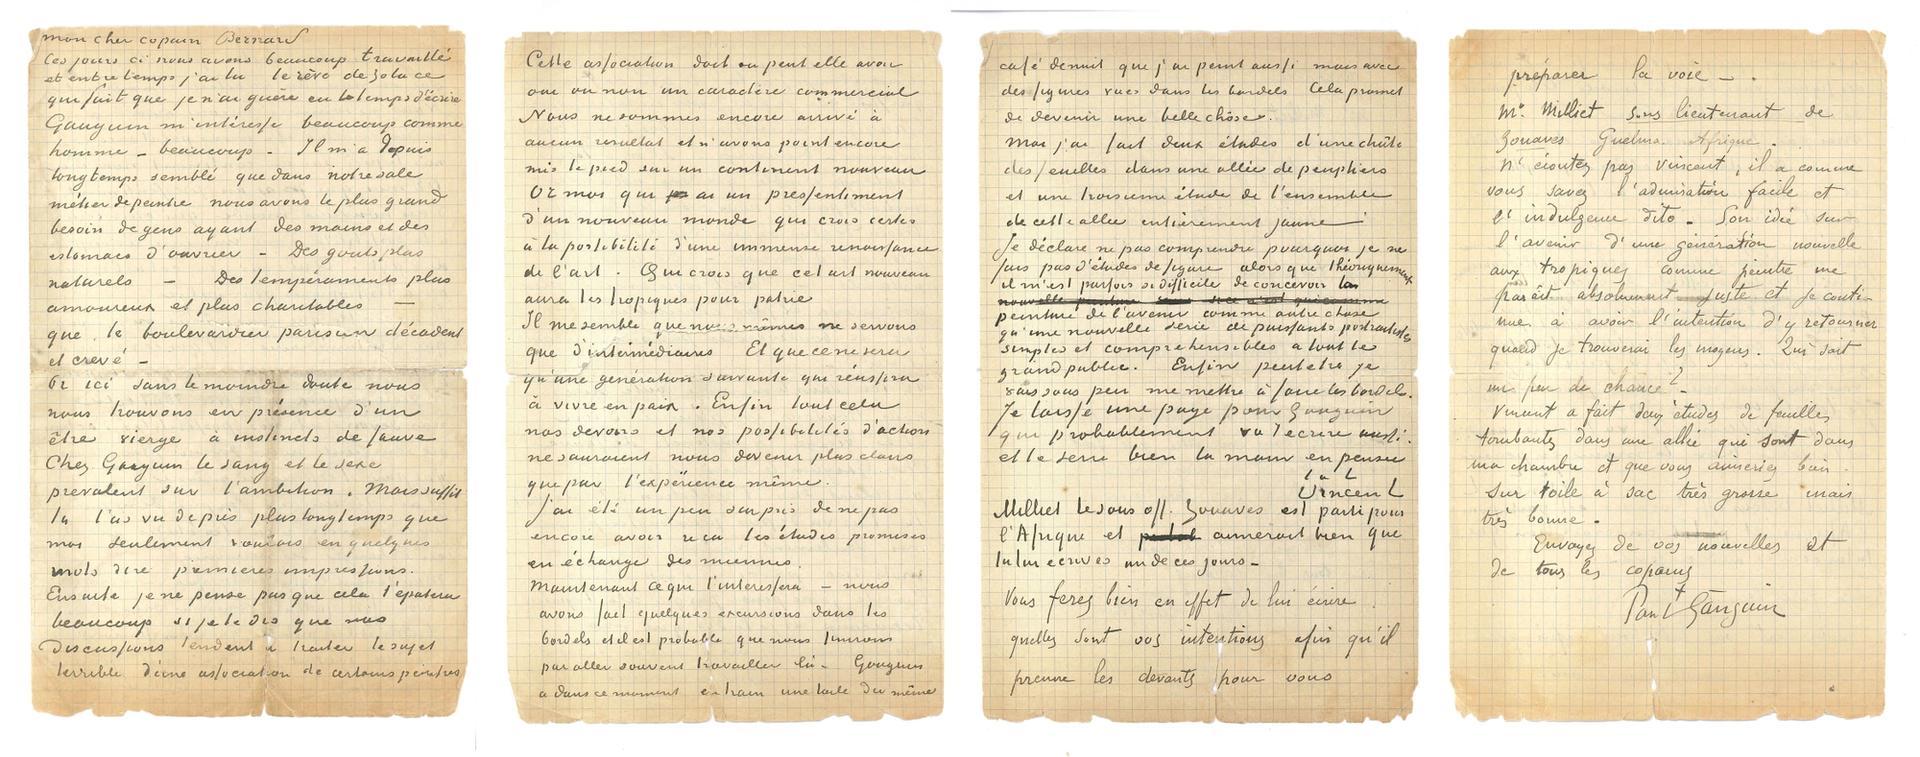 Letter from Vincent van Gogh and Paul Gauguin to Emile Bernard, Arles, 1-2 November 1888 Courtesy of Drouot Estimations, Paris